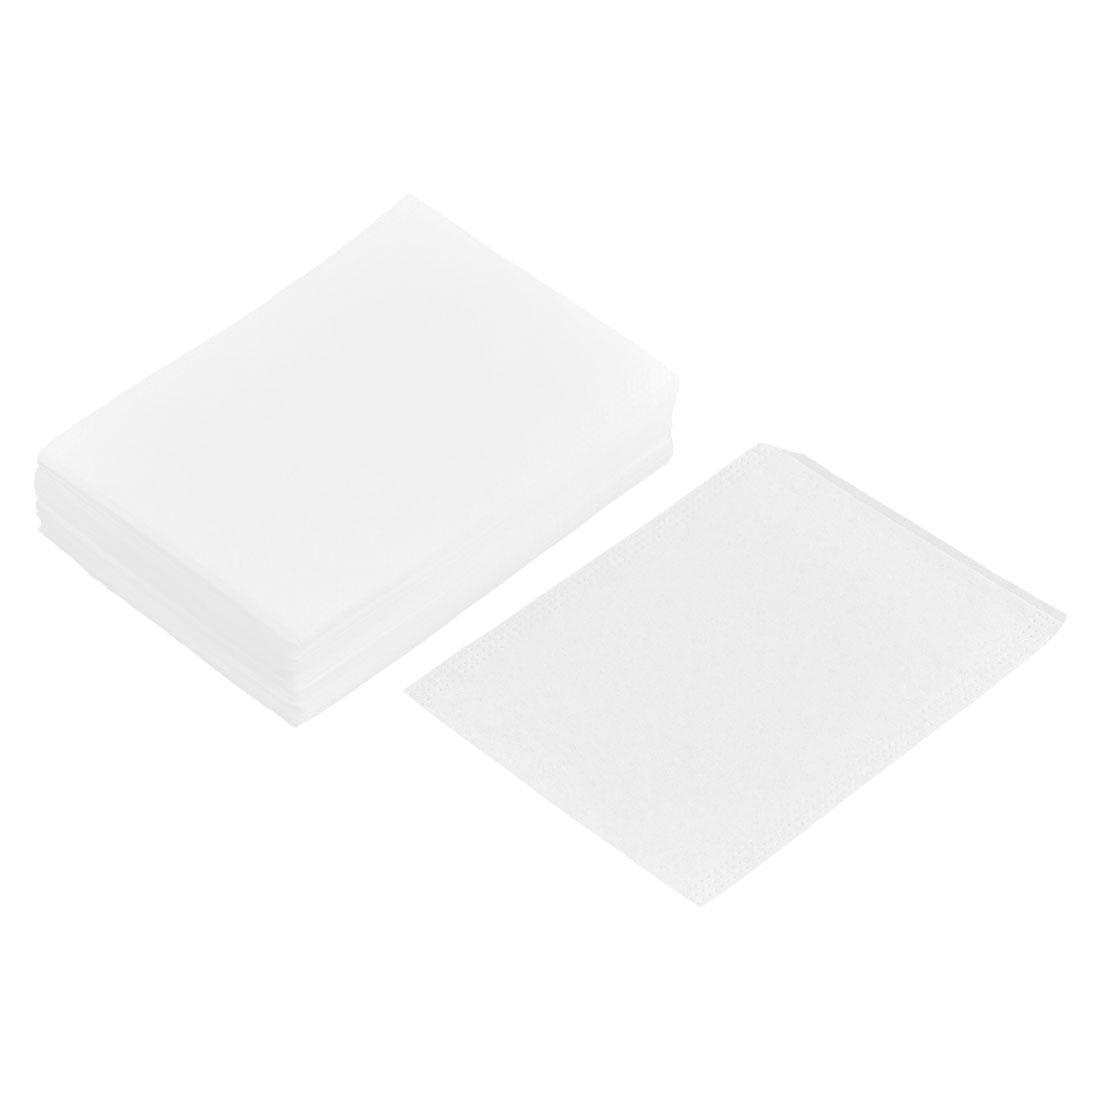 Household Paper Disposable Empty Herbal Powder Spice Tea Filter Bag White 8cm x 6cm 100 Pcs